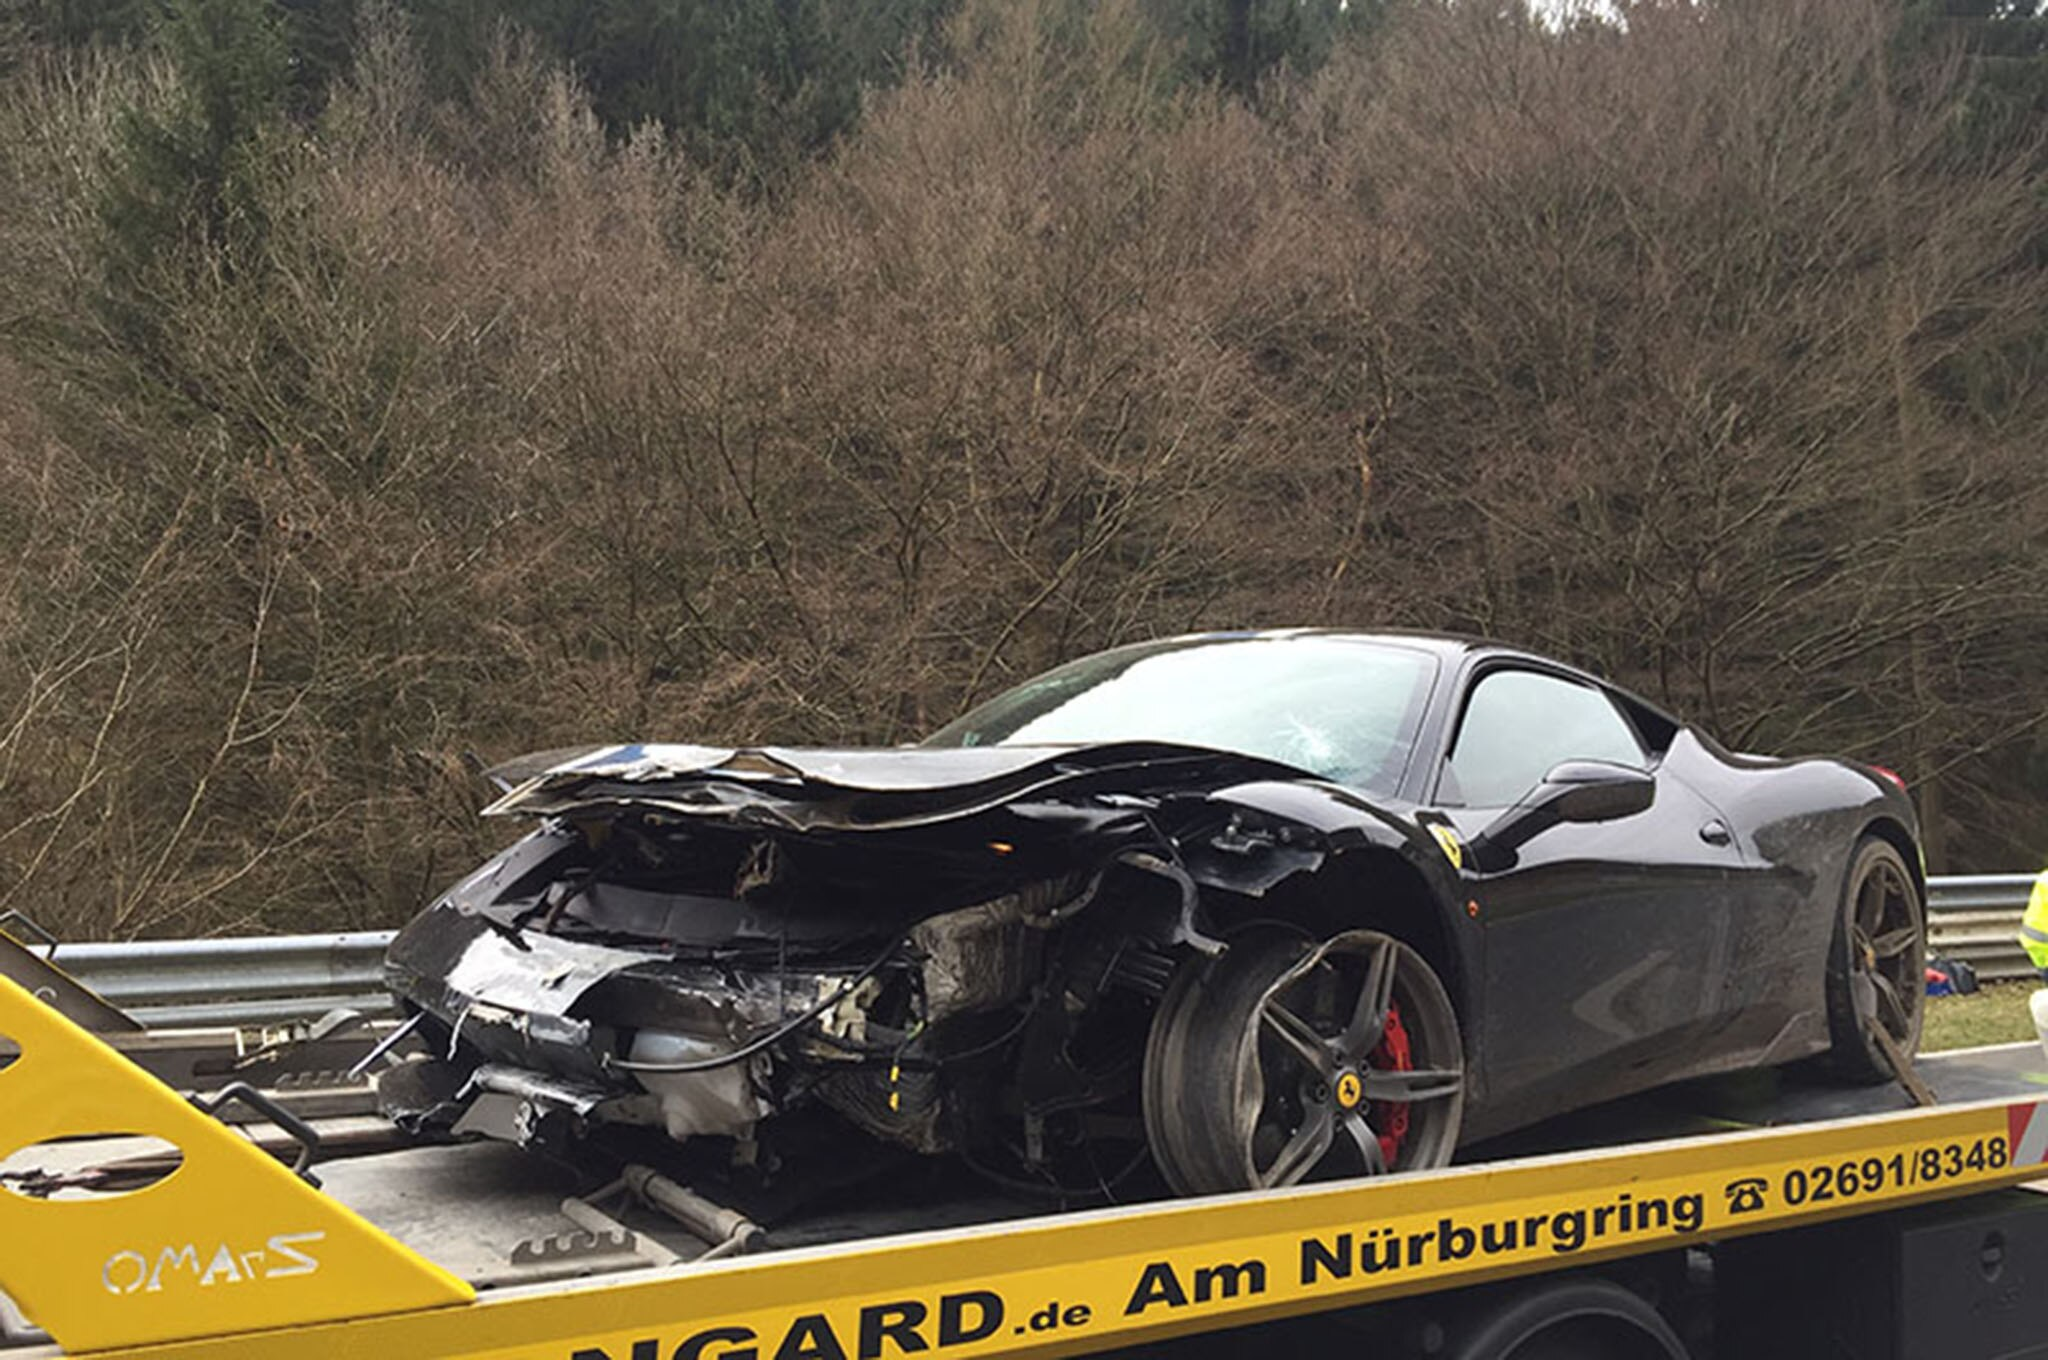 Dead Ferrari 458 Speciale